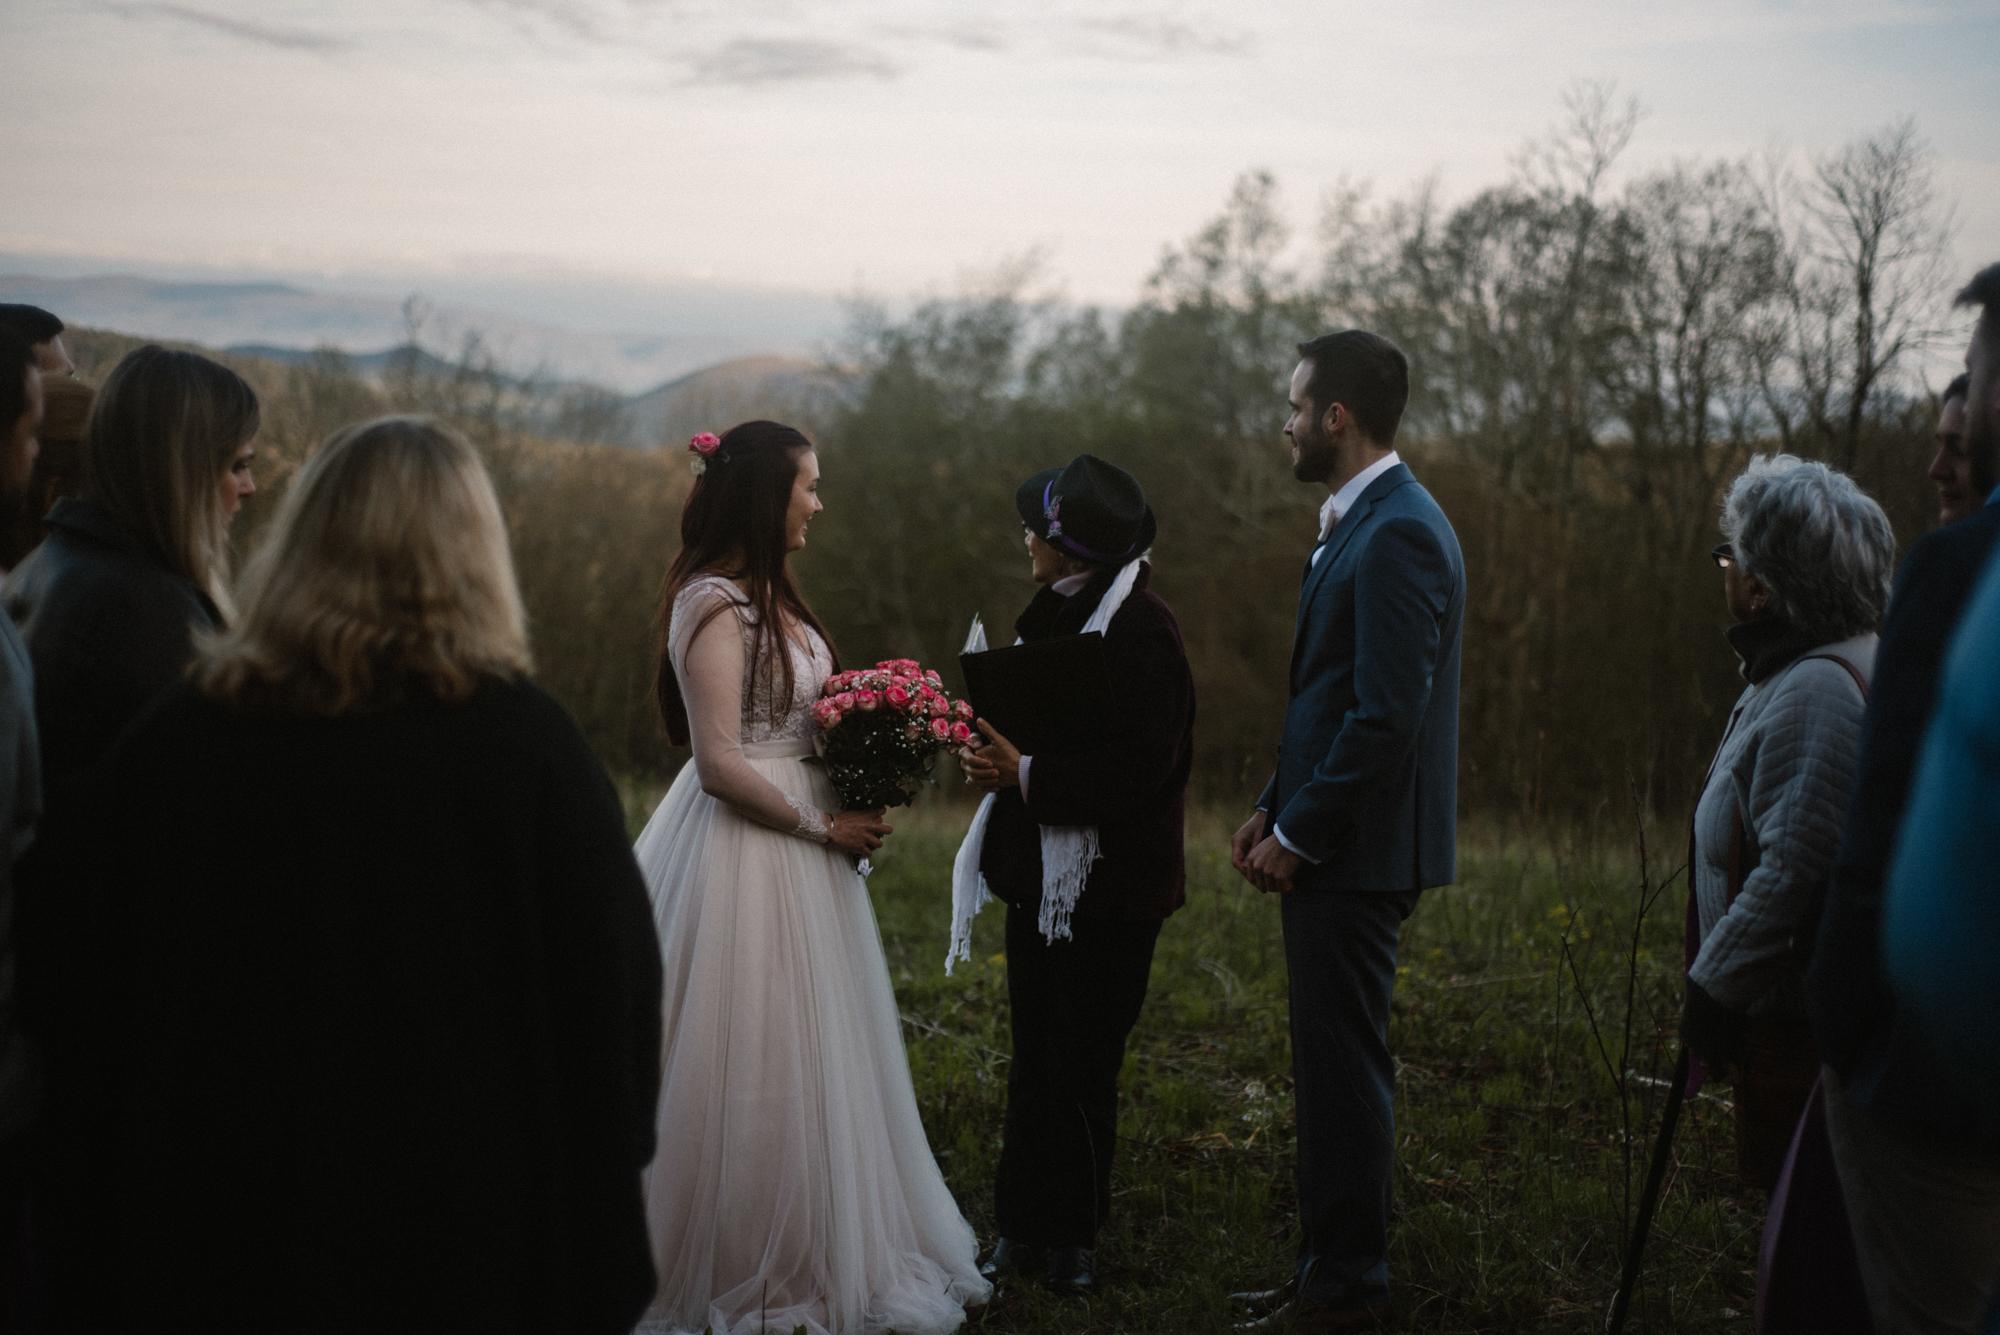 Paula and Andrew - Small Adventurous Wedding in Shenandoah National Park - Blue Ridge Mountain Wedding - White Sails Creative - Mountain Elopement_16.jpg